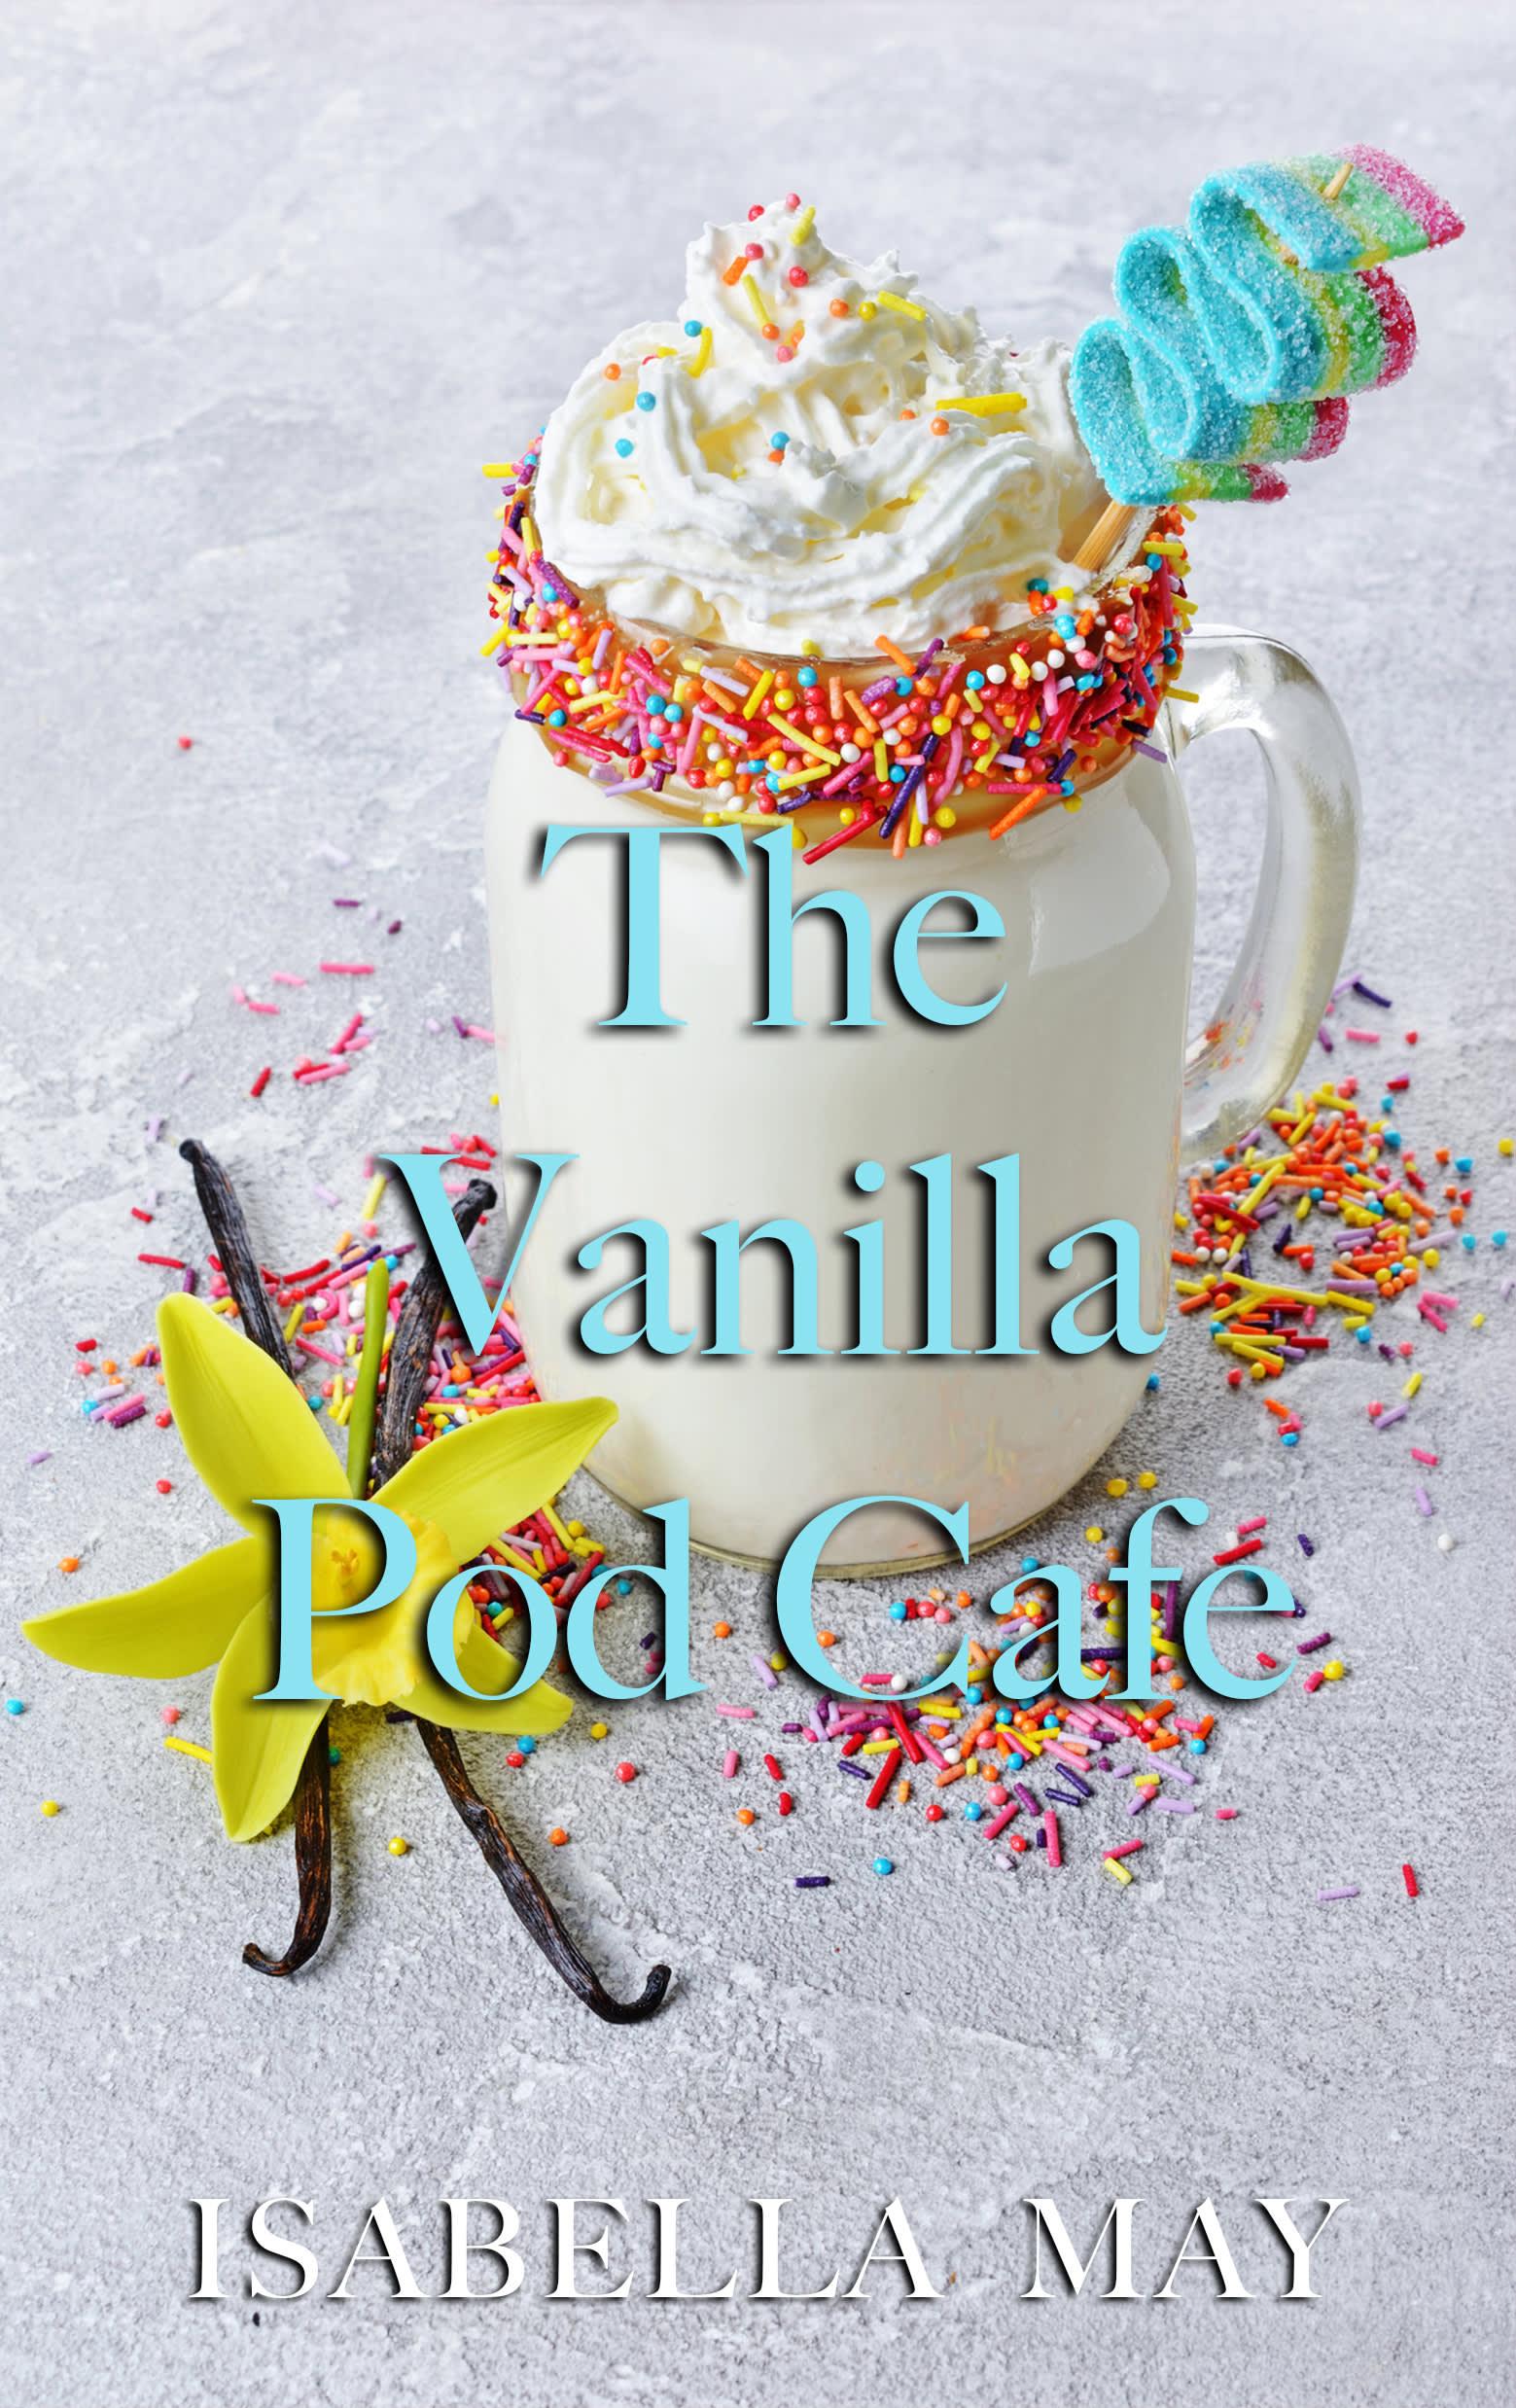 THE-VANILLA-POD-CAFE-final-cover.jpg